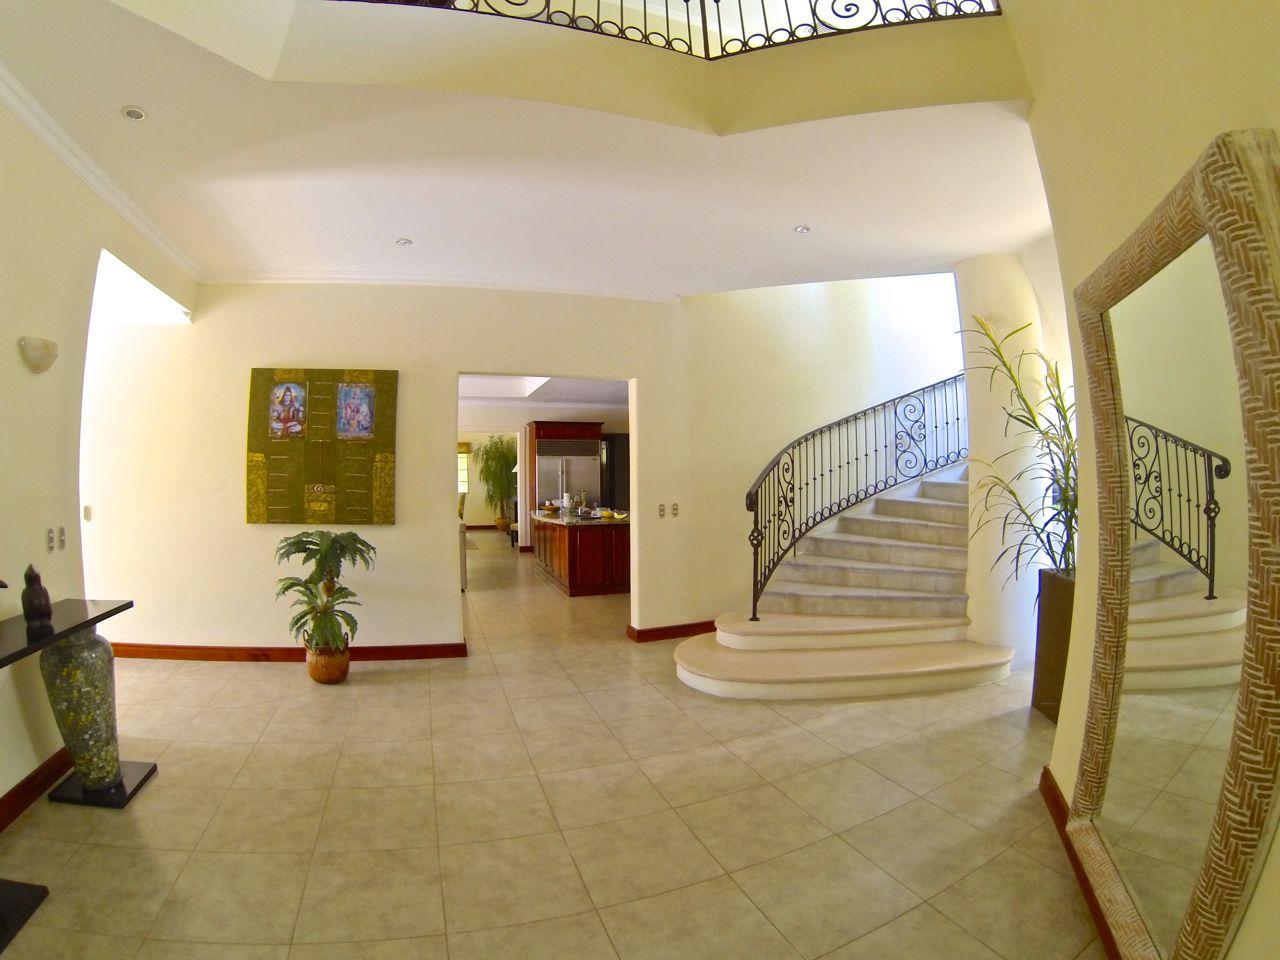 Casa_Pacifica01.jpg